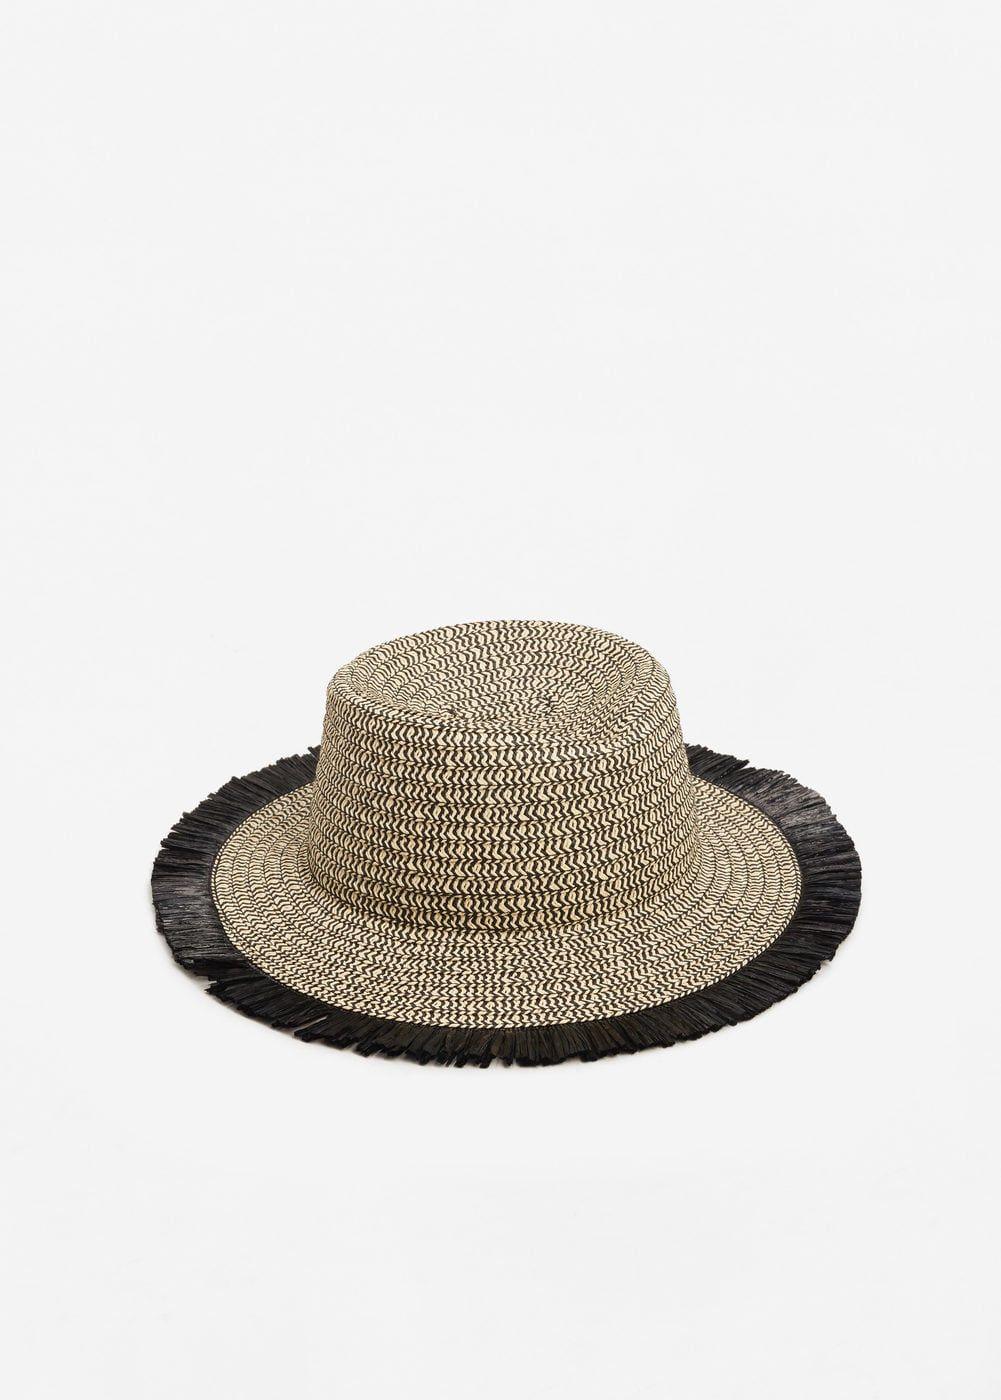 Sombrero paja bicolor - Mujer  9f82be4ec99